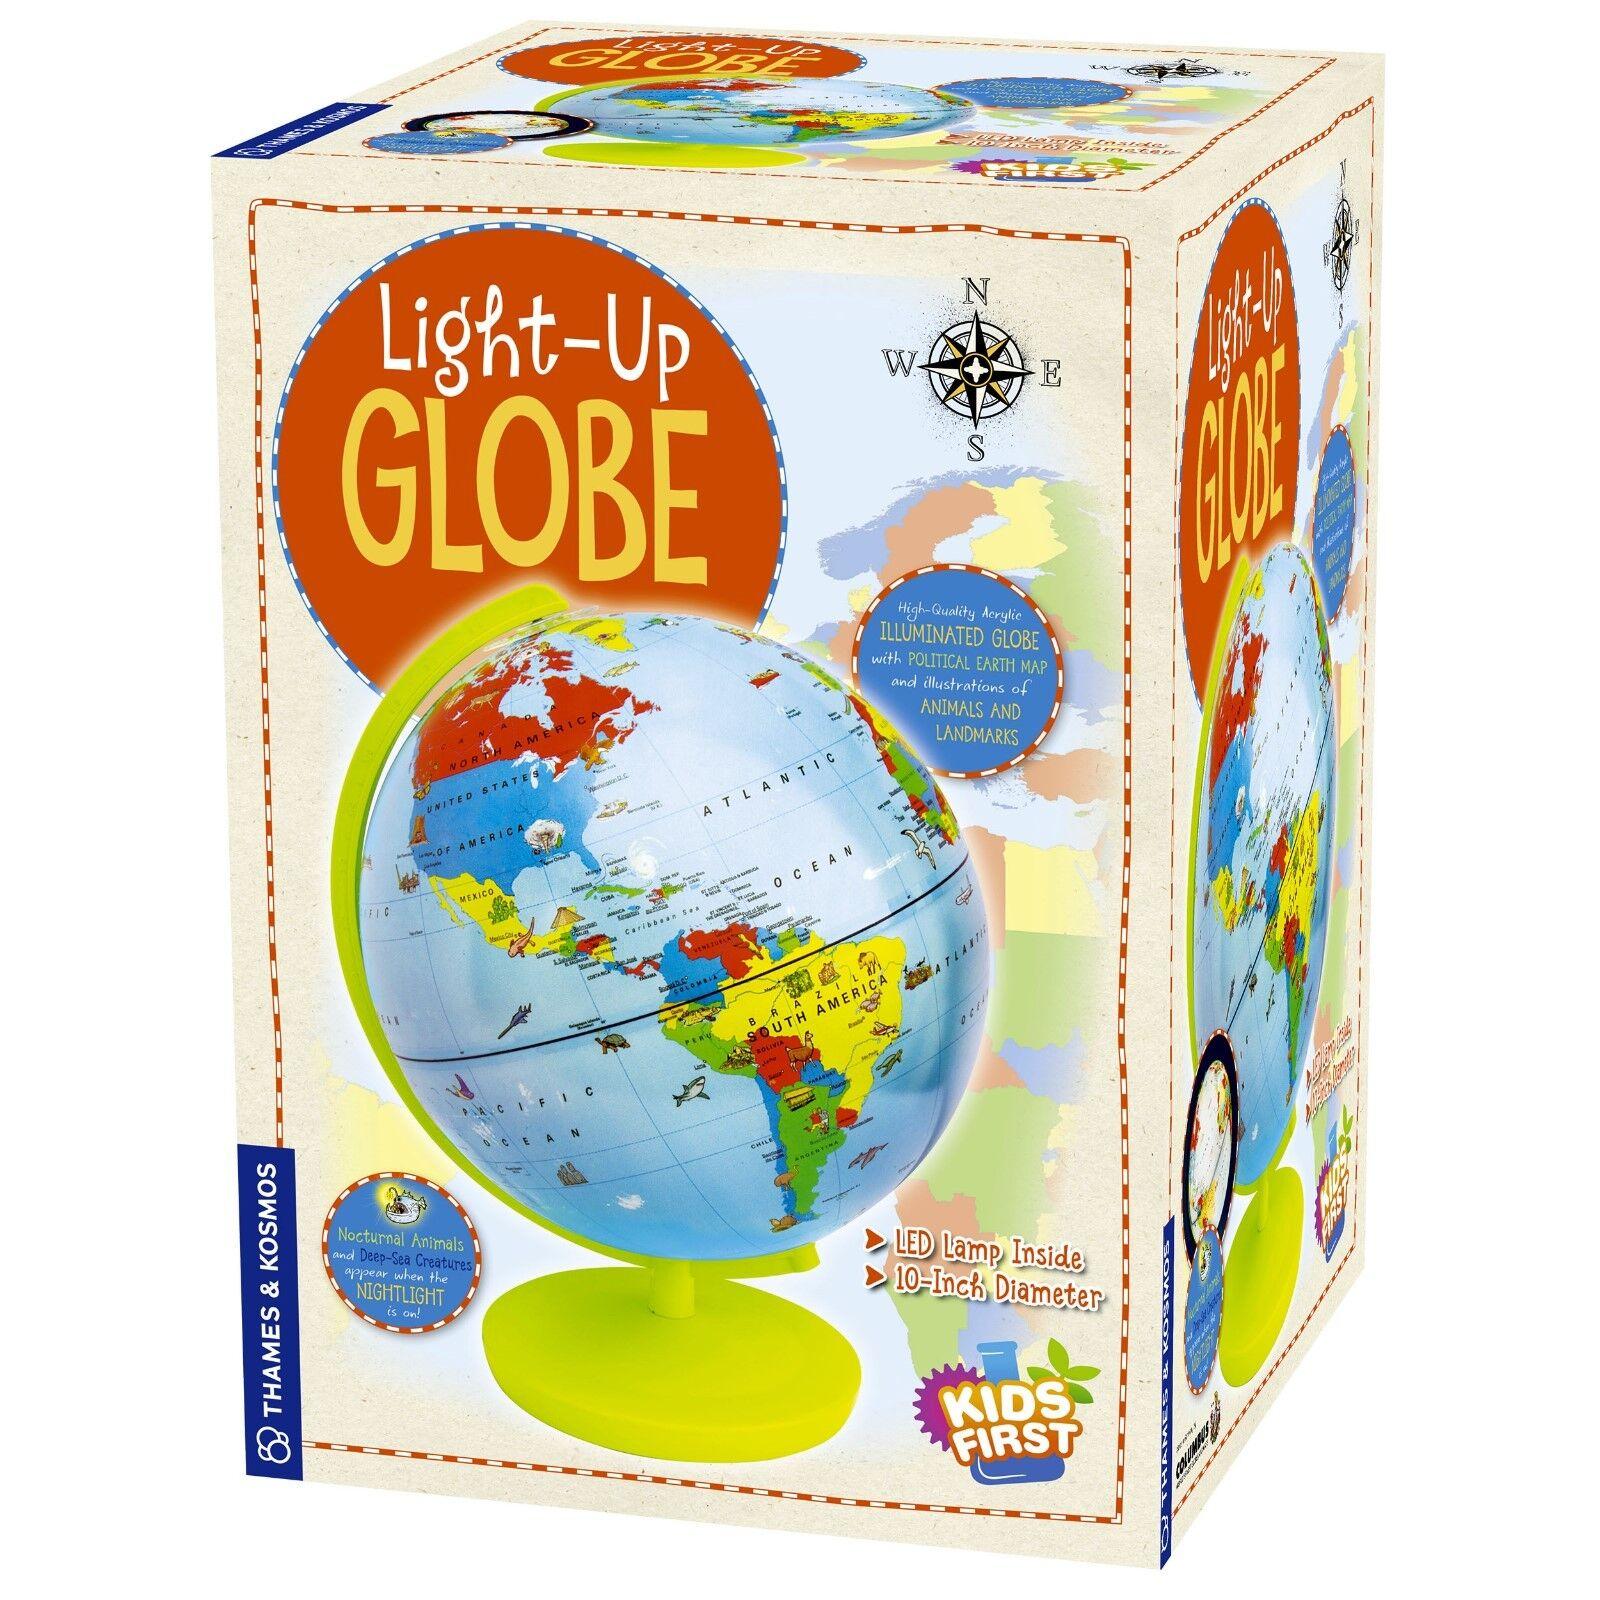 Light-Up Globe Kids First Thames & Kosmos Acrylic Illuminated Globe 673024